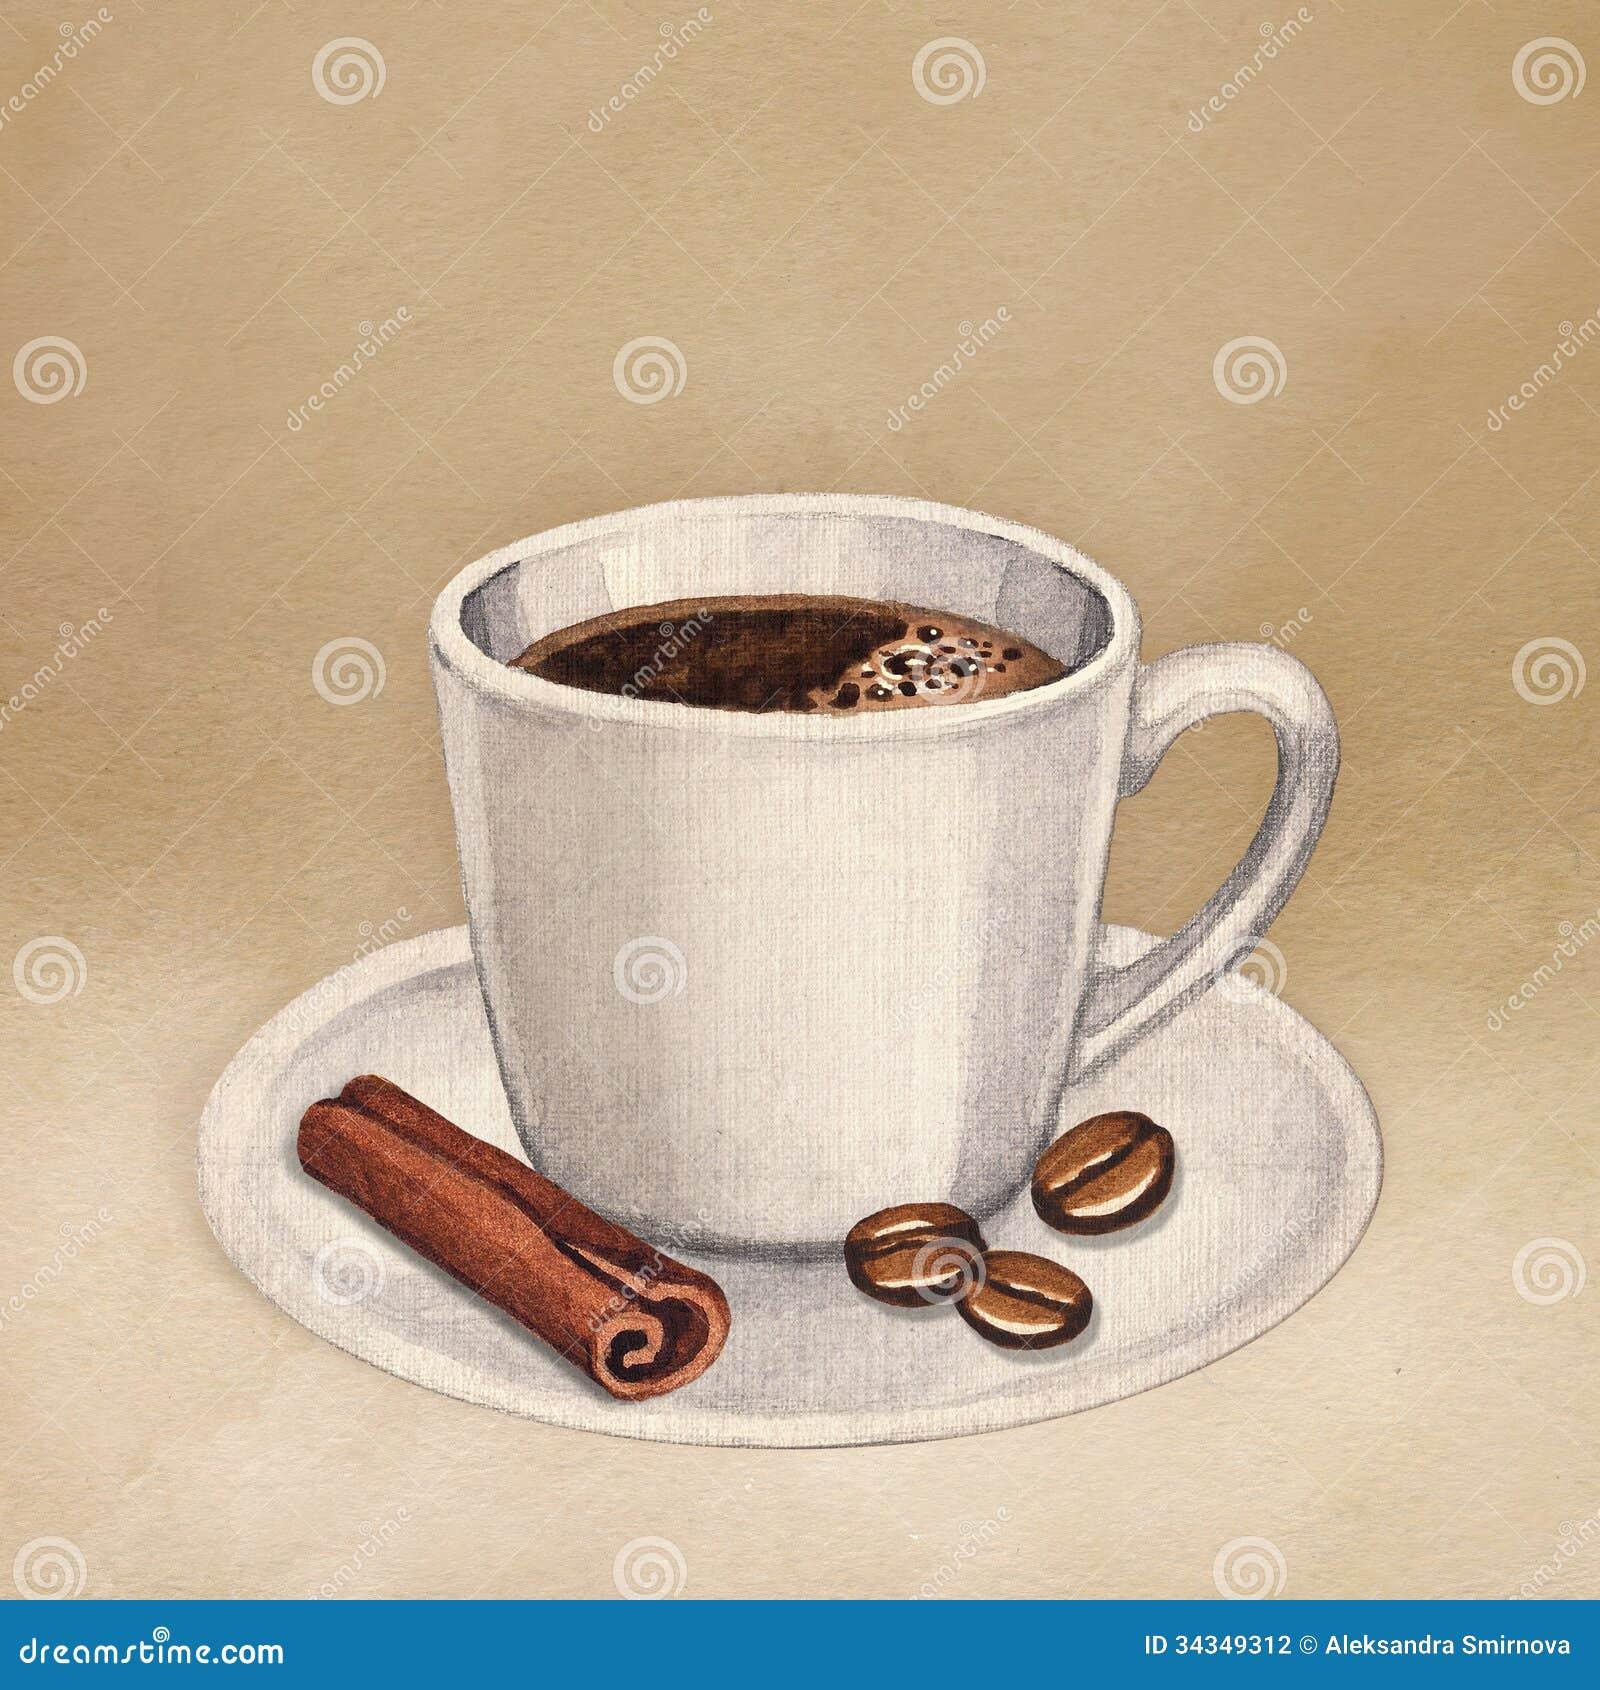 Cafe Tasse Chocolate